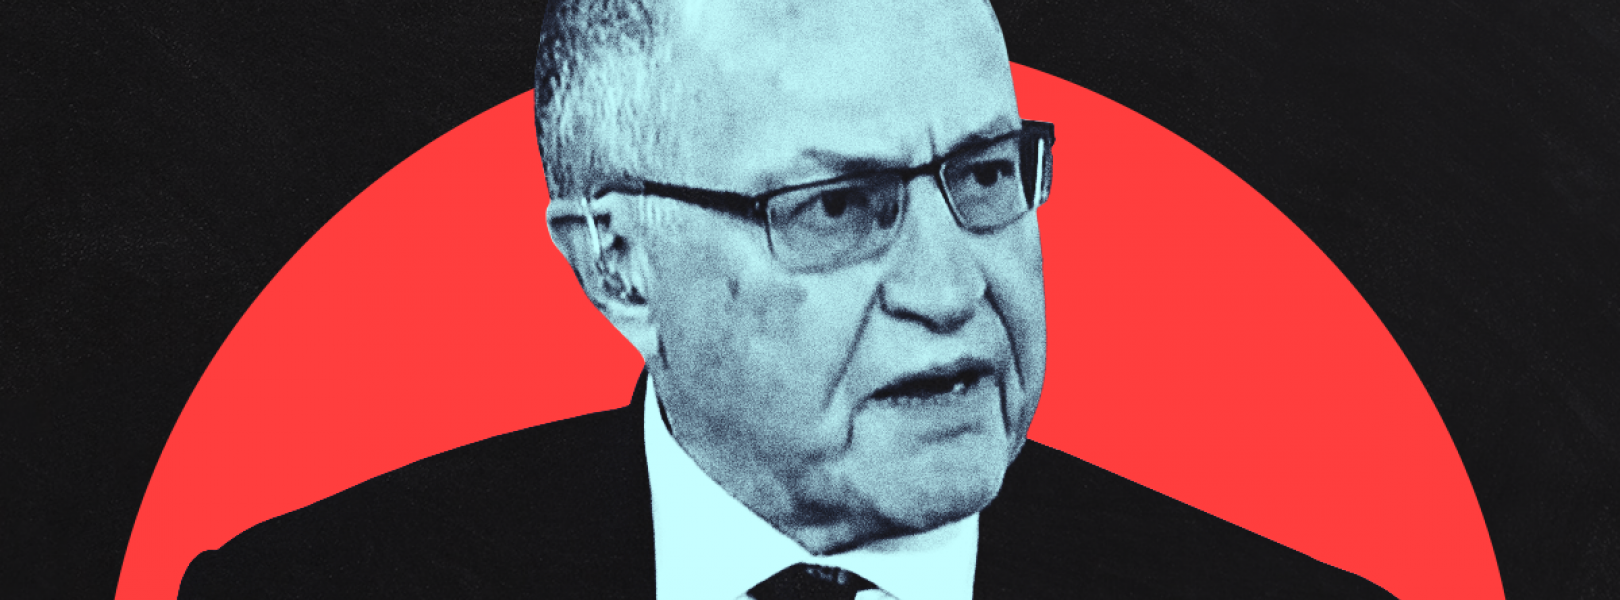 alan-dershowitz-cable-news-illegal-settlement-jeffrey-epstein.png